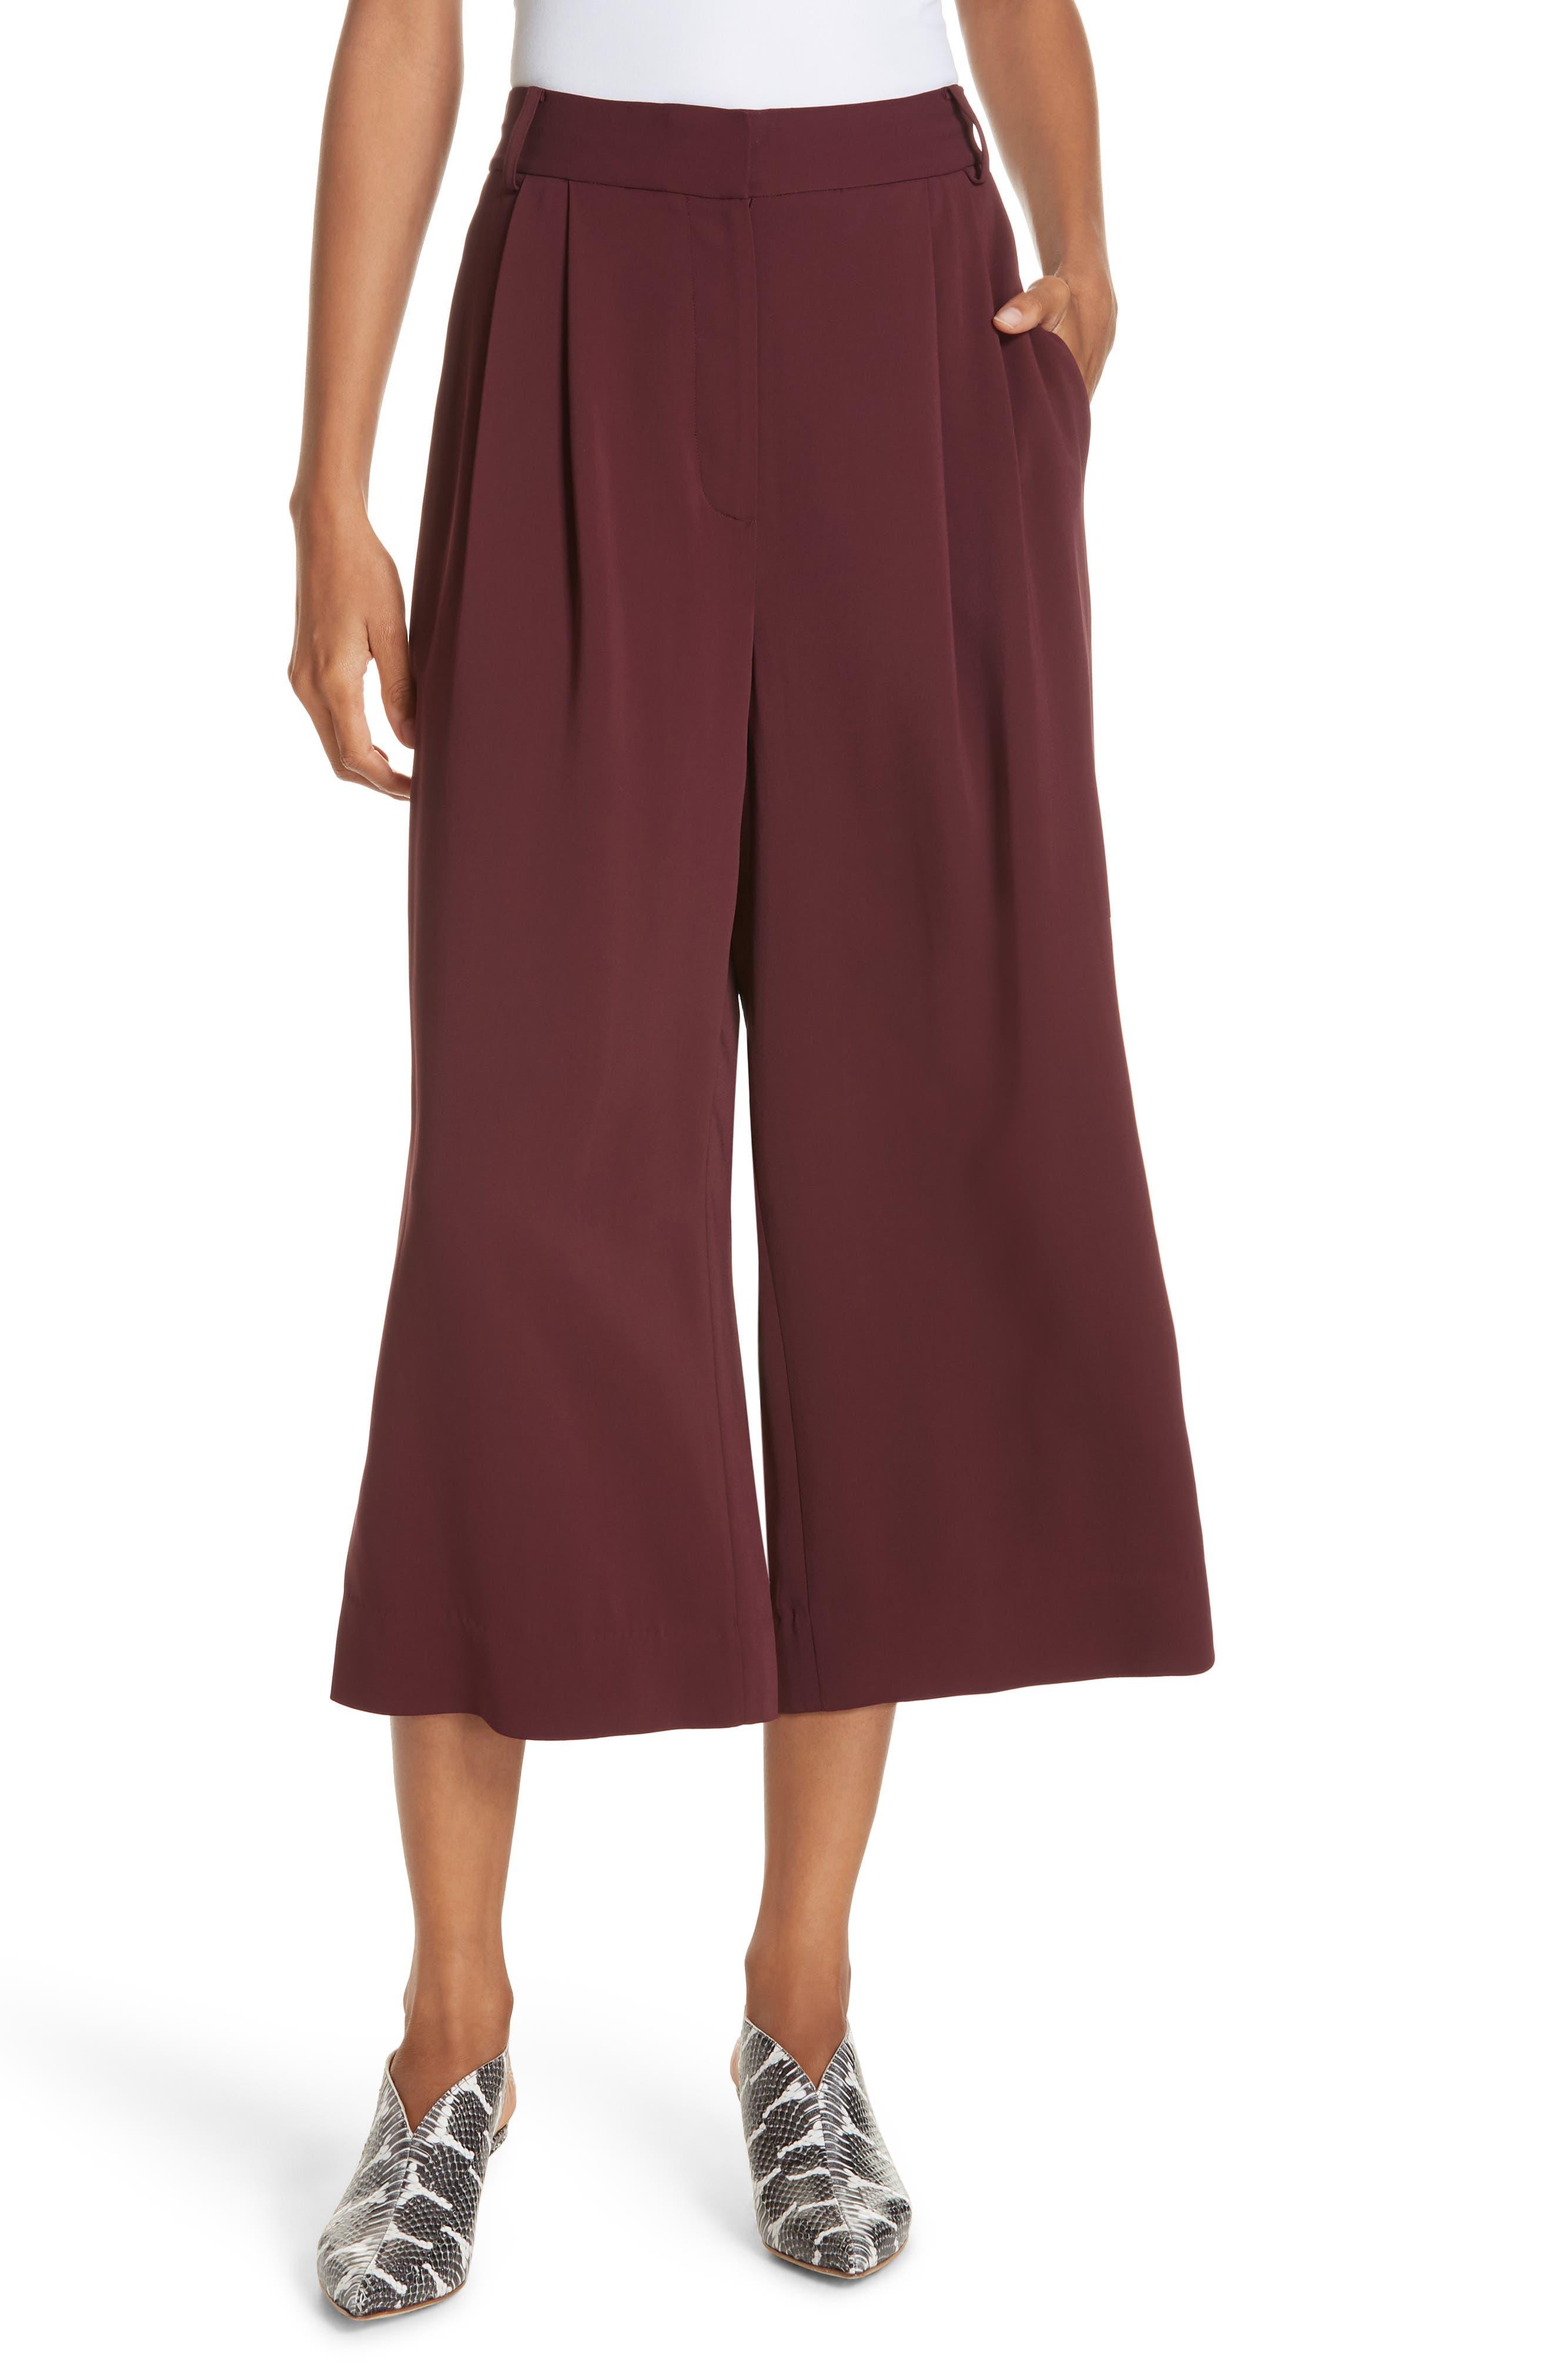 TIBI Stella Stretch Suiting Crop Pants, Main, color, DARK CURRANT